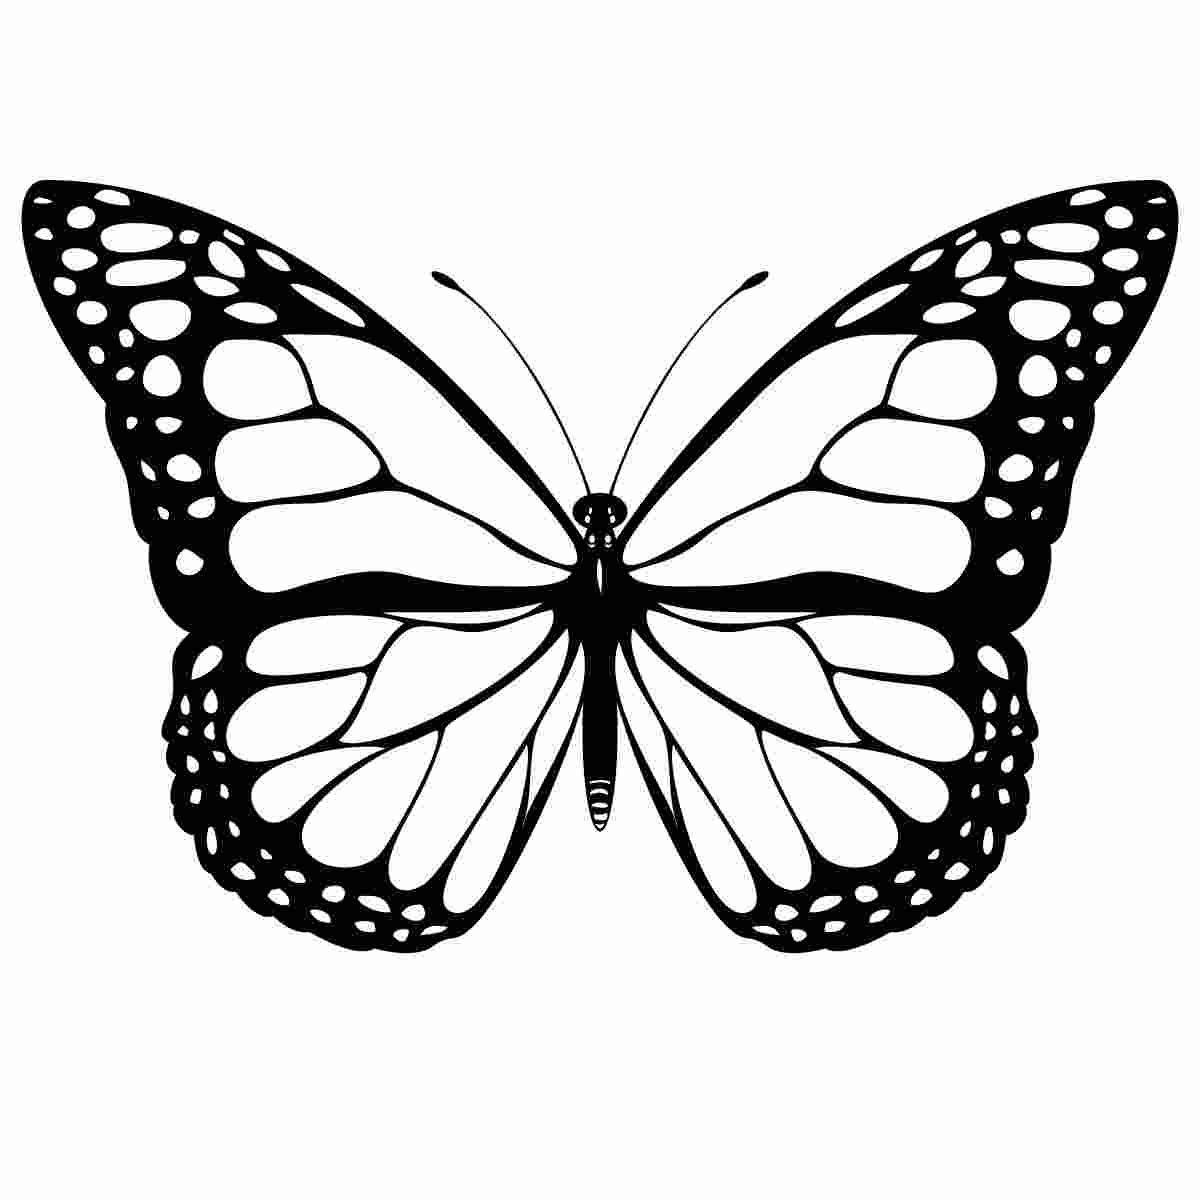 Kleurplaten Vlinders Vlinder Tekening Monarch Vlinder Tattoo Tatoeage Stencils